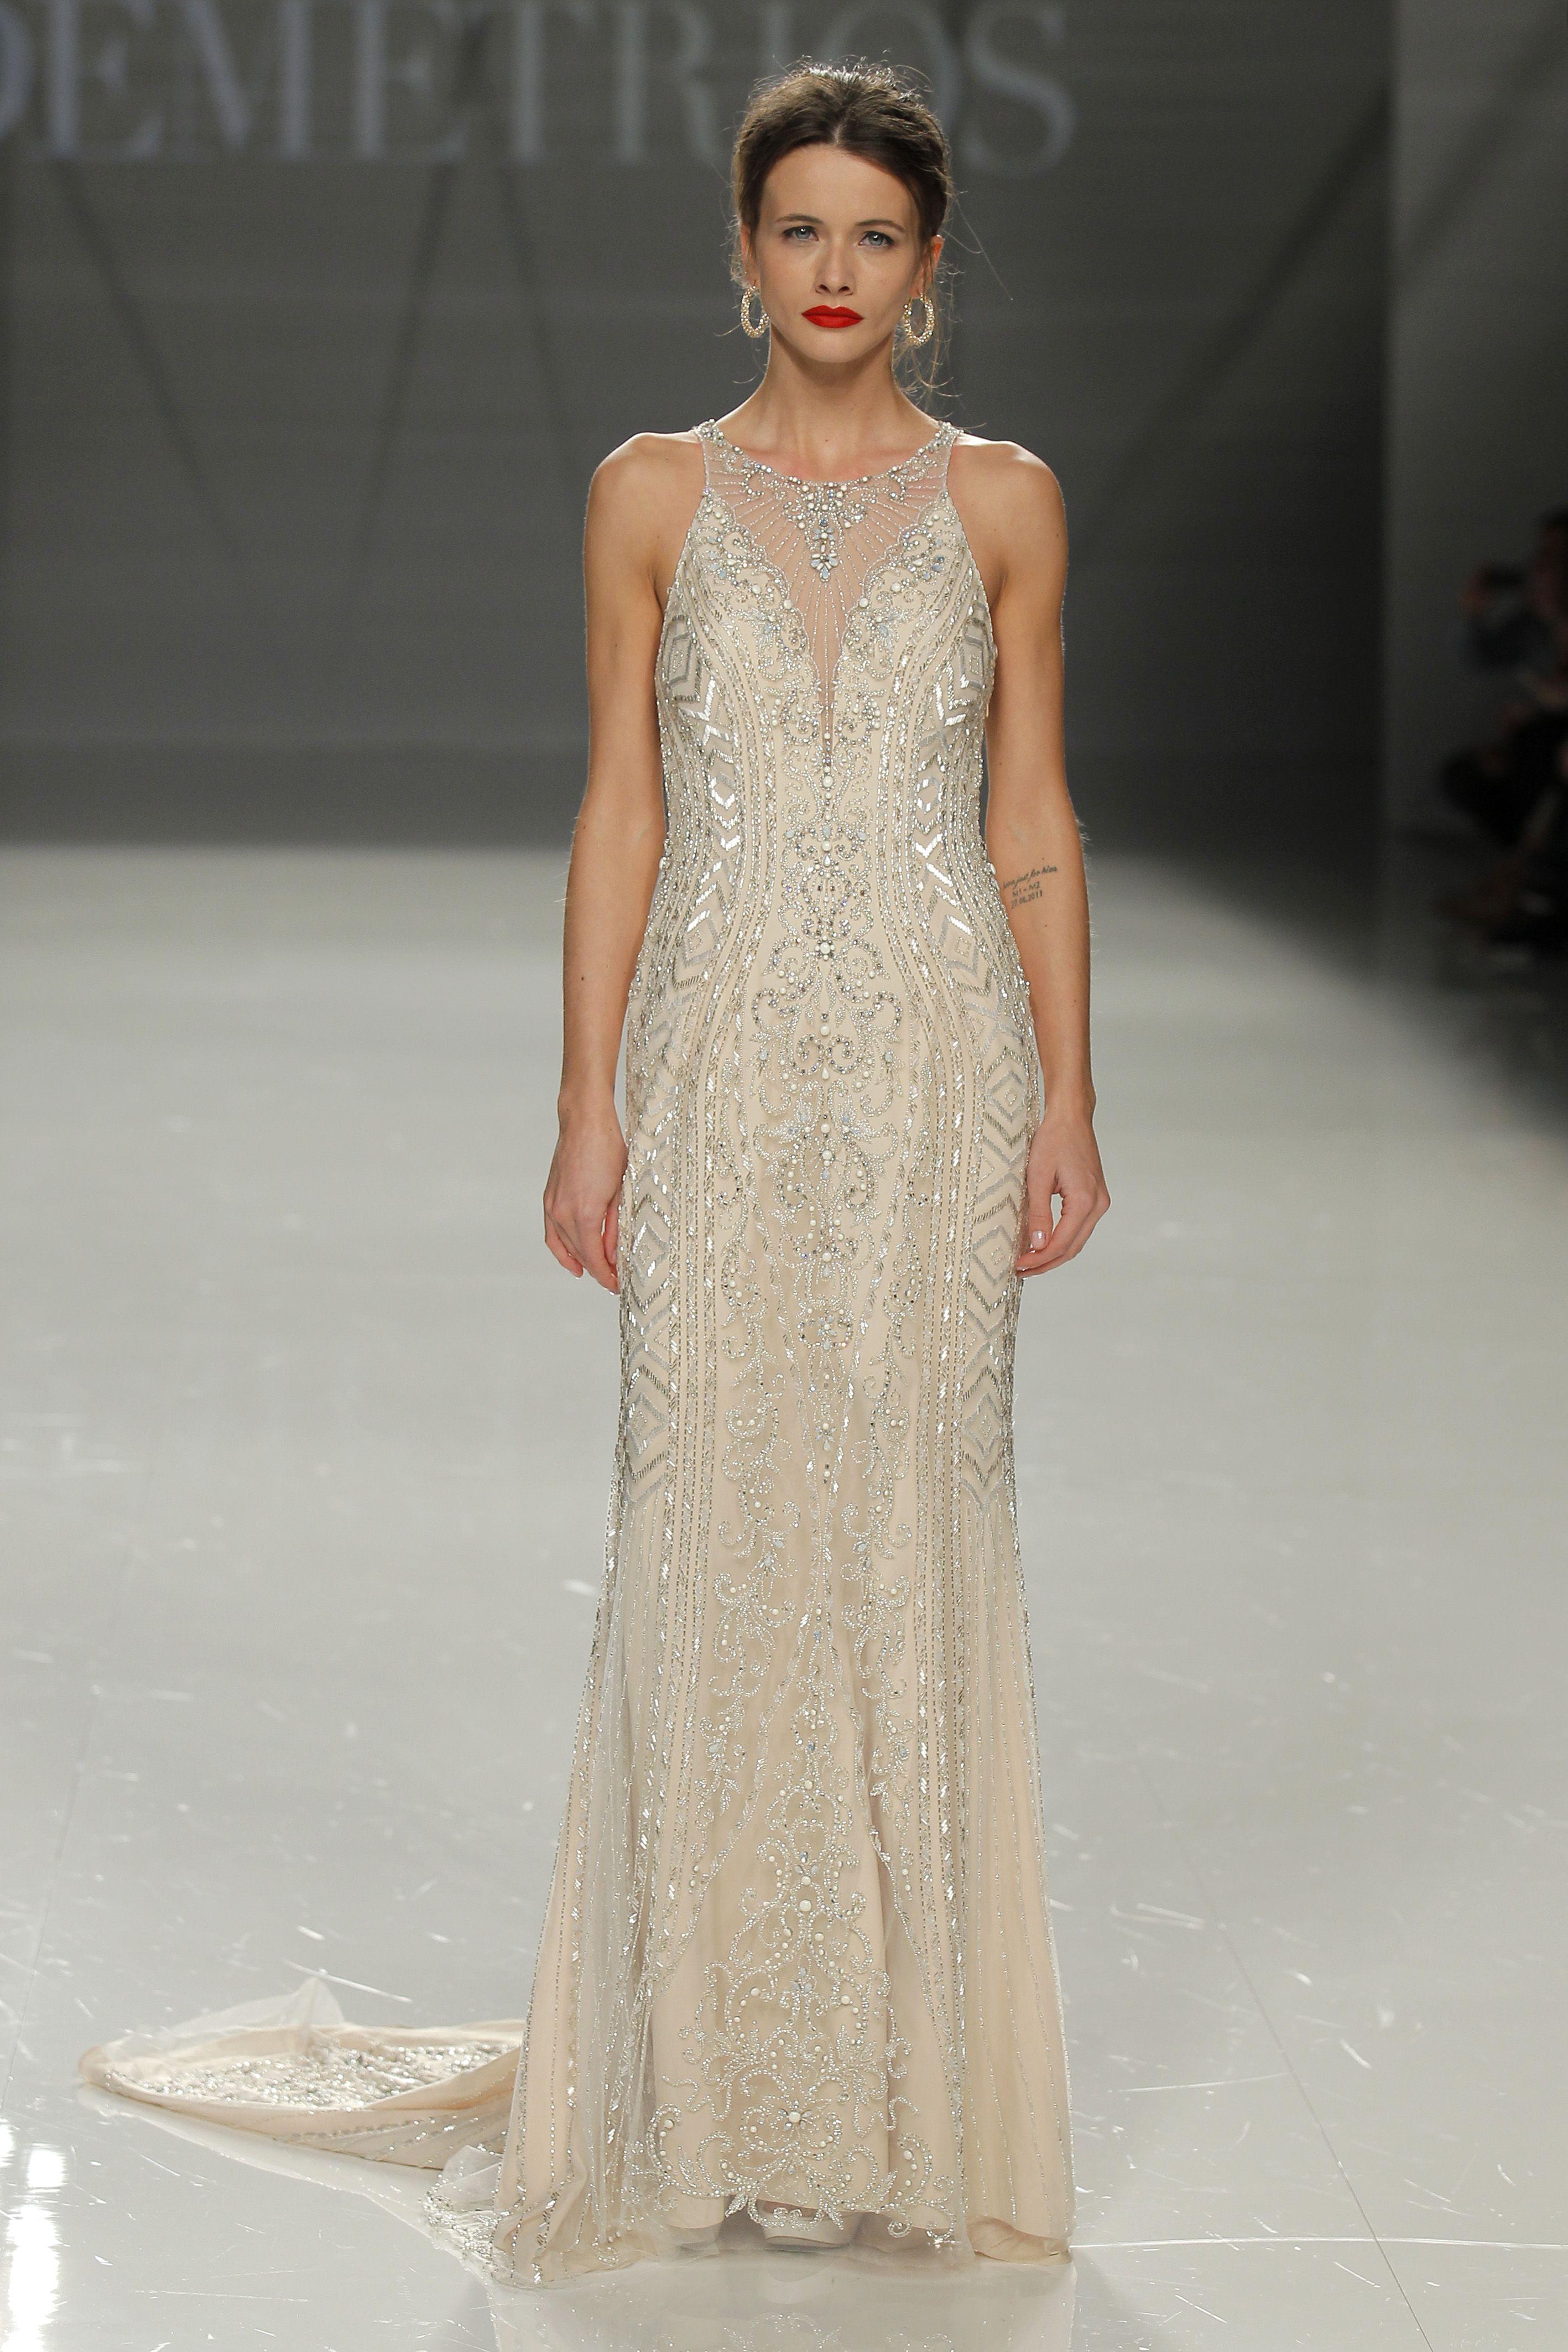 Pin by daniela miron on fantazia couture pinterest wedding dress